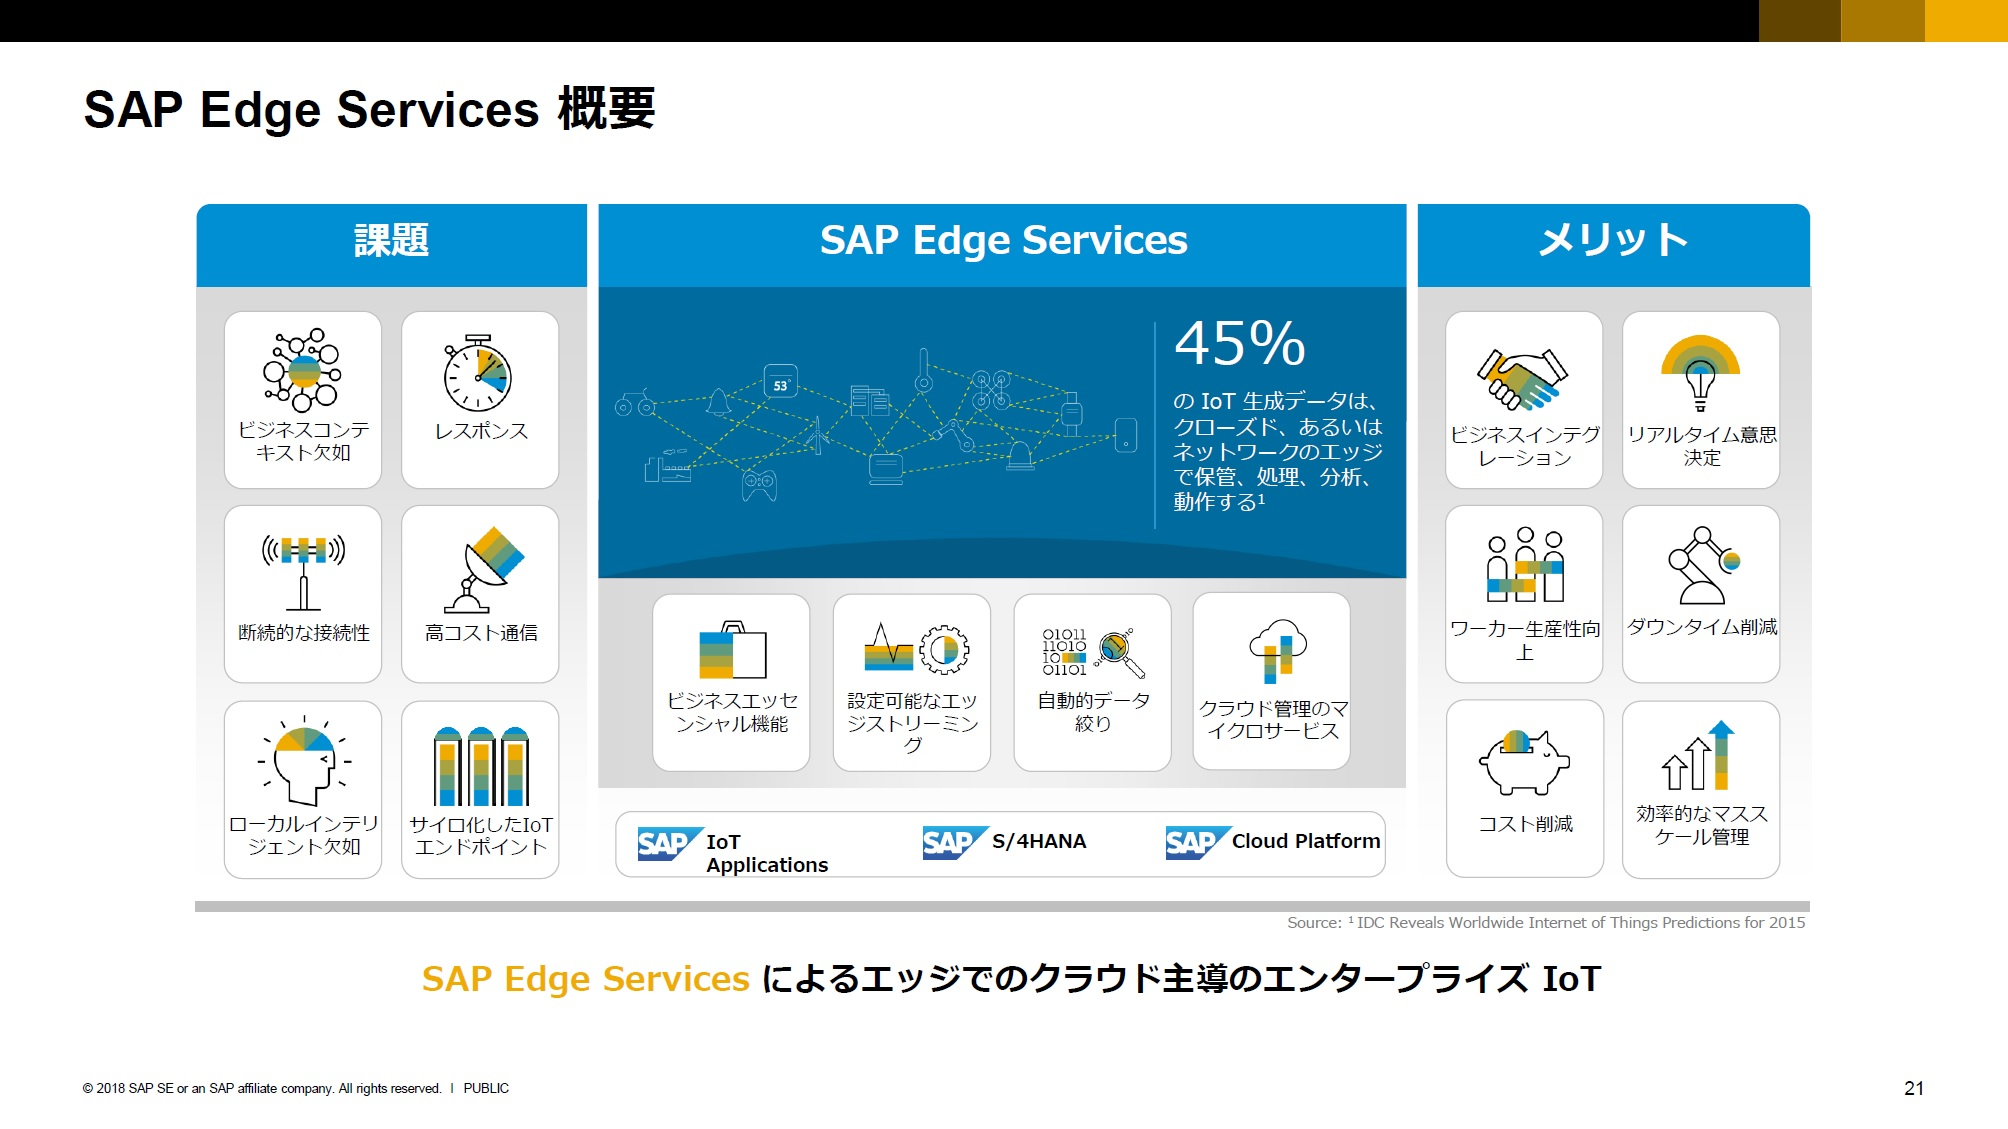 13. Edge Service 1